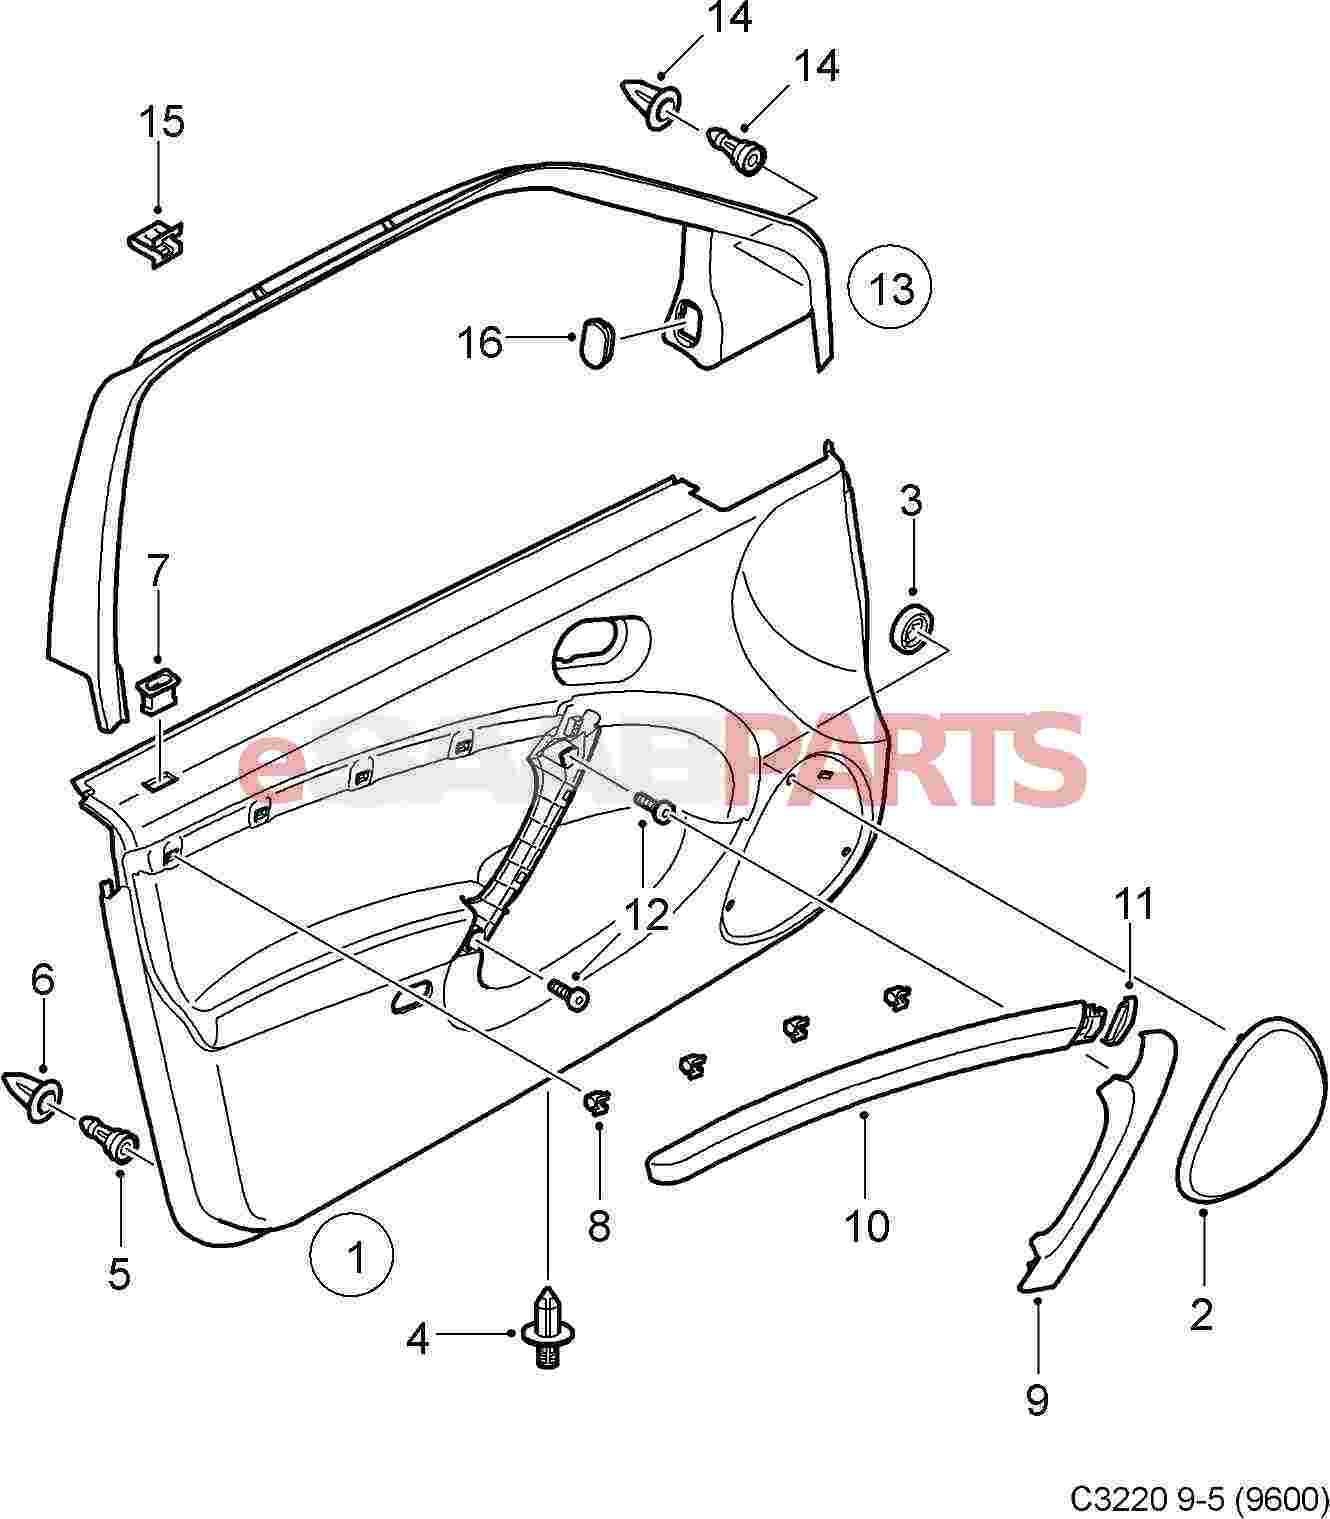 View all parts in diagram sc 1 st esaabparts